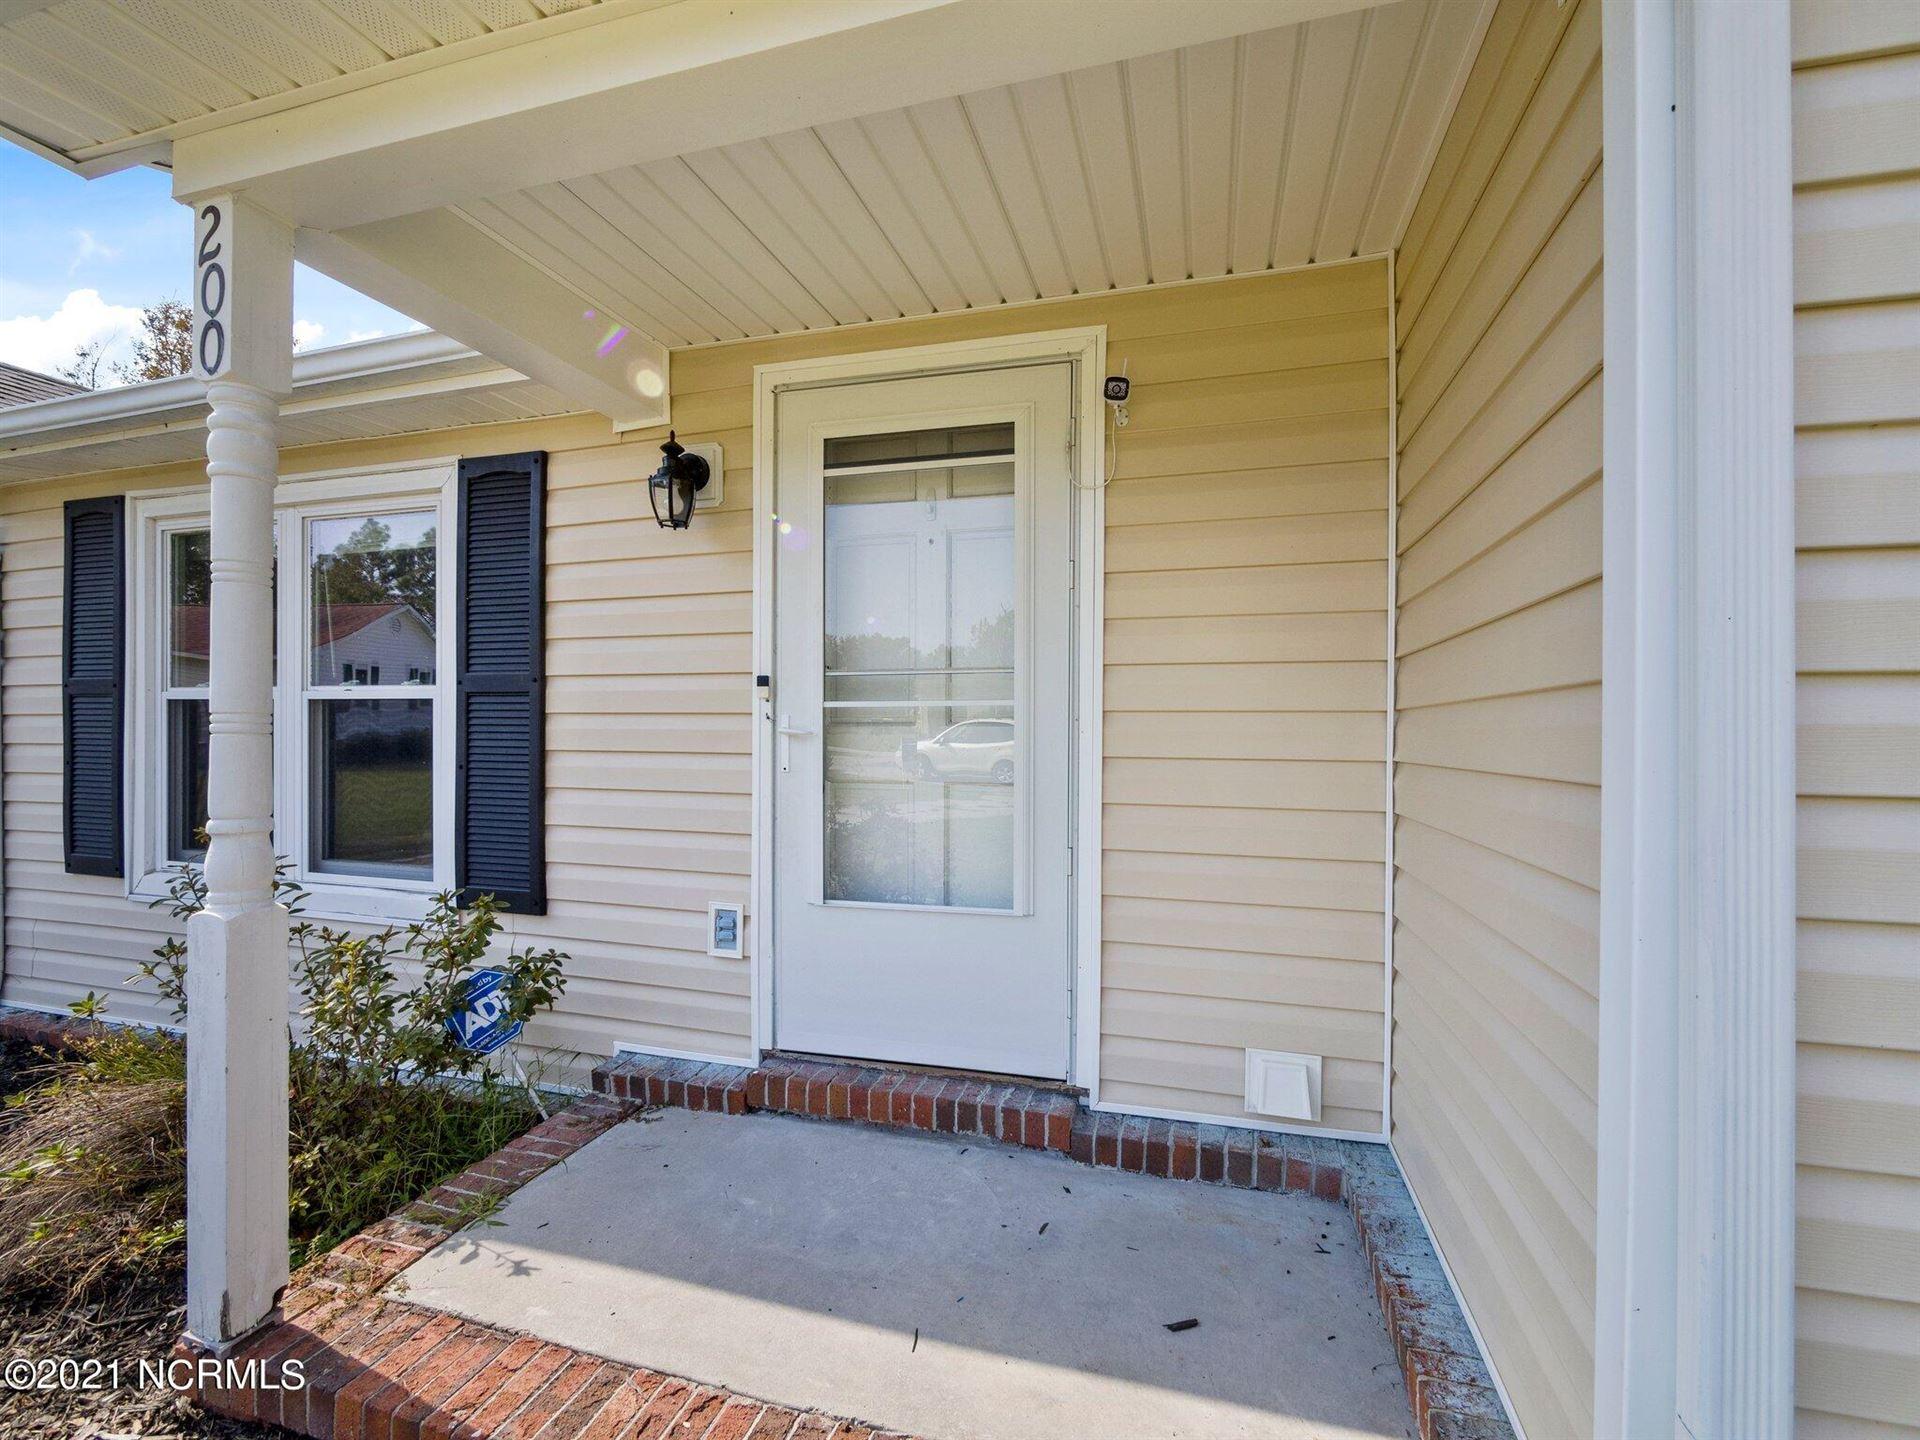 Photo of 200 W Volant Street, Hubert, NC 28539 (MLS # 100295273)